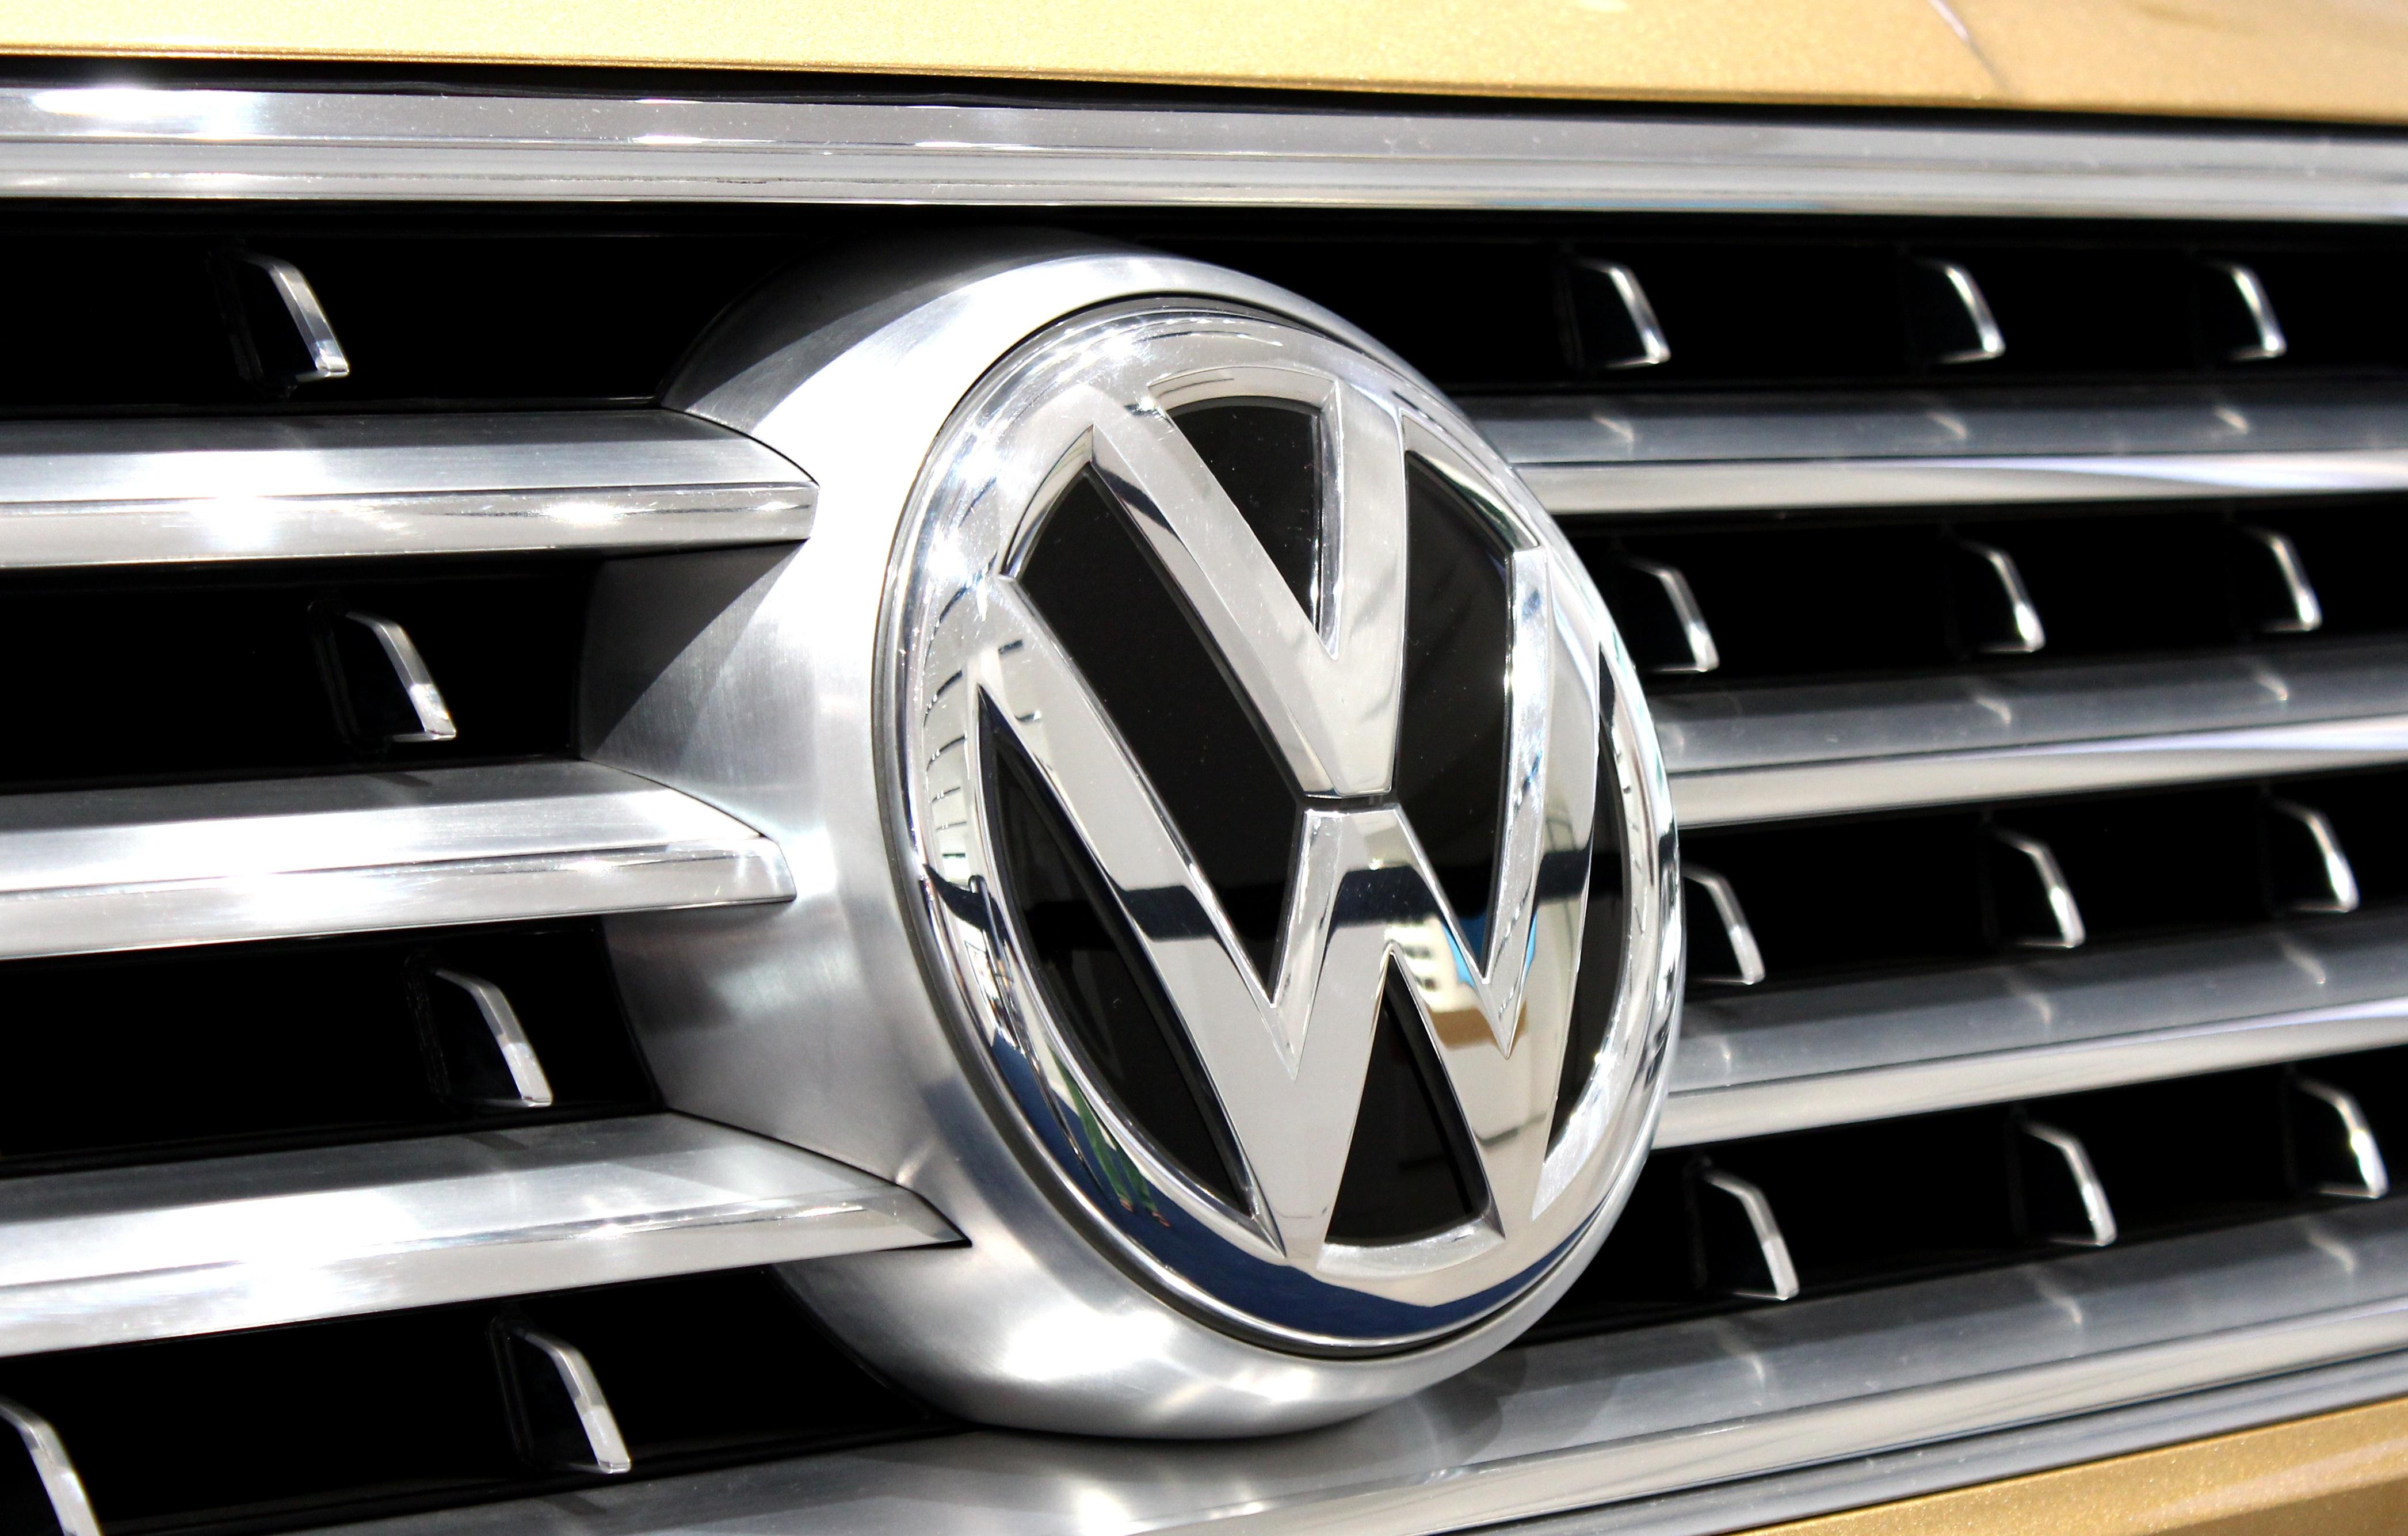 Free Images : wheel, vw, volkswagen, stamp, grille, grill, bumper, mask, chrome, logo, rim ...